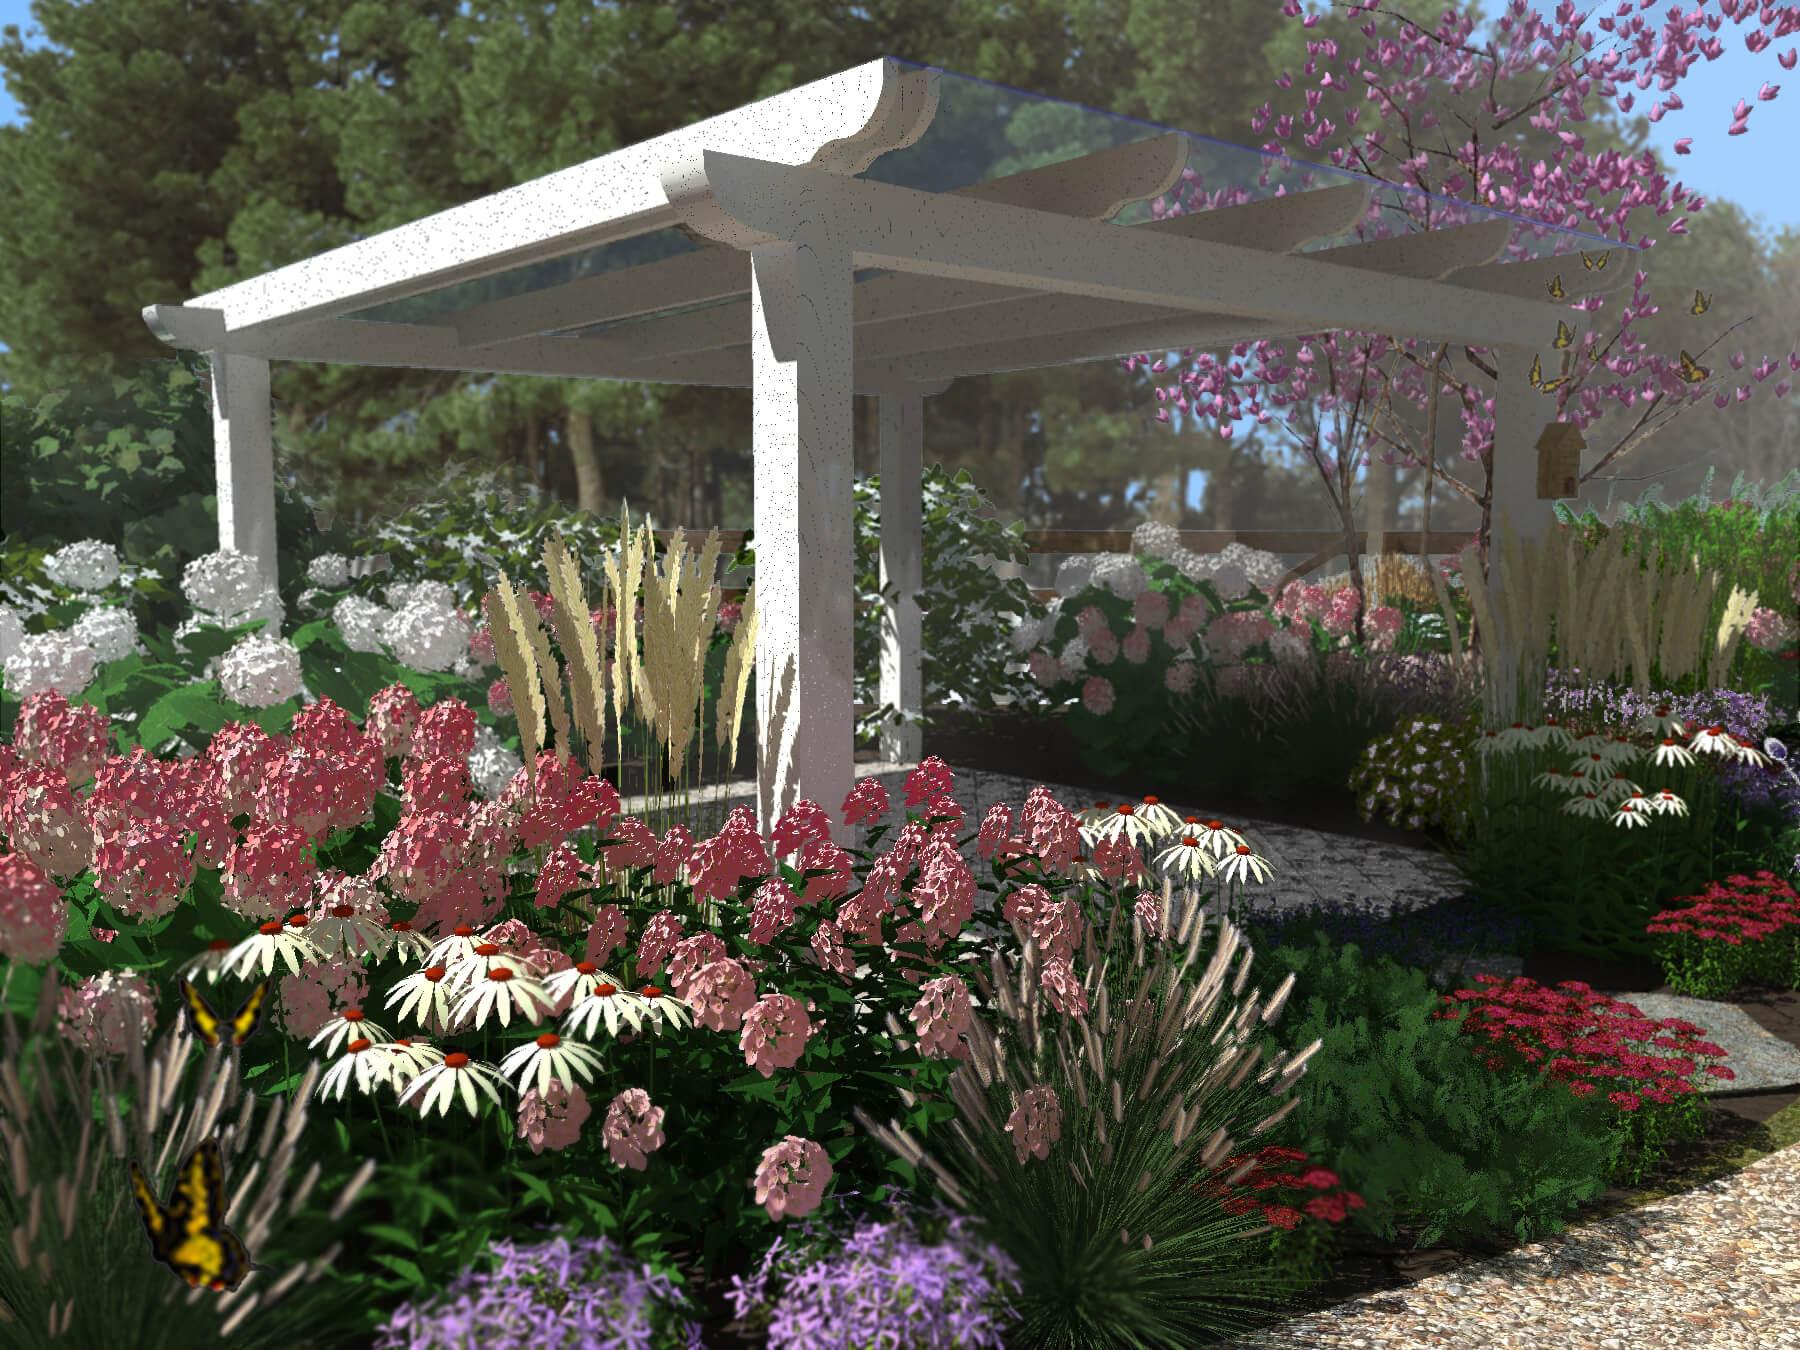 altana ogród angielski dworek